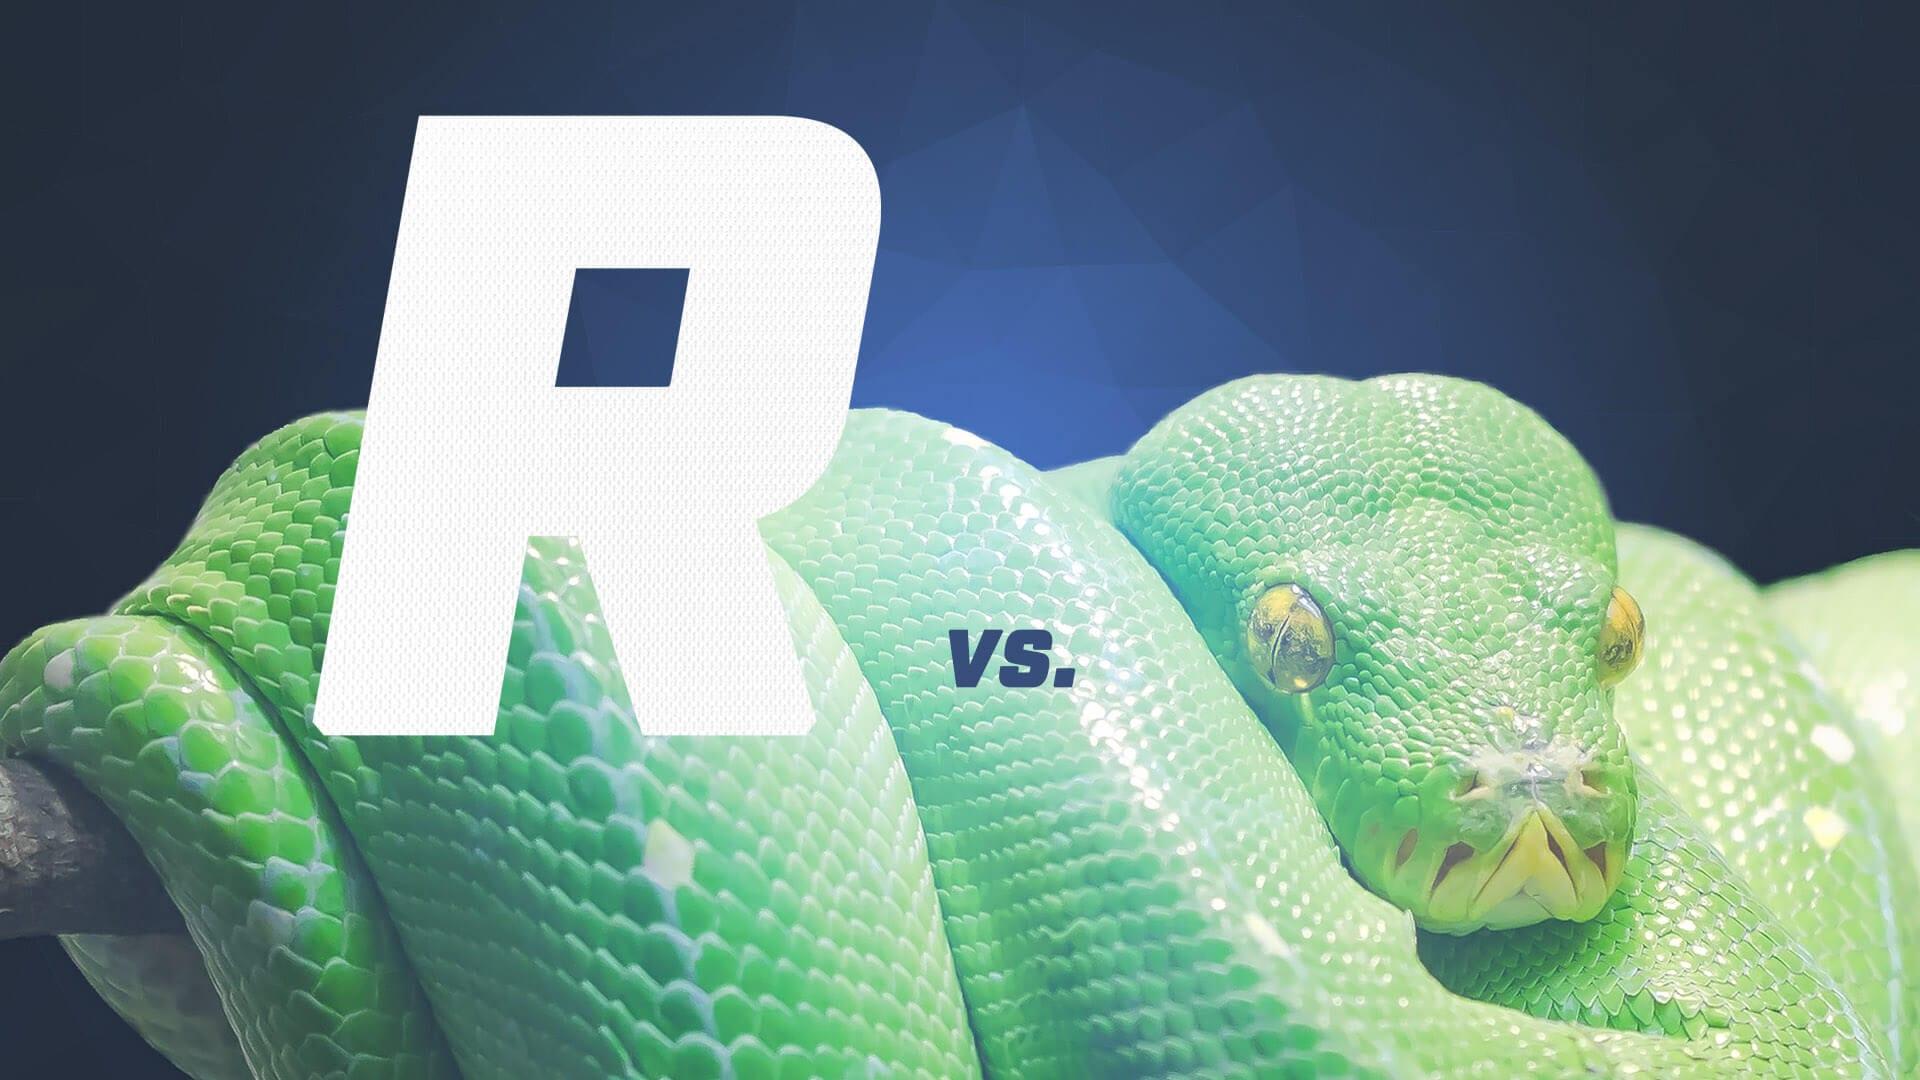 python-vs-r-data-science